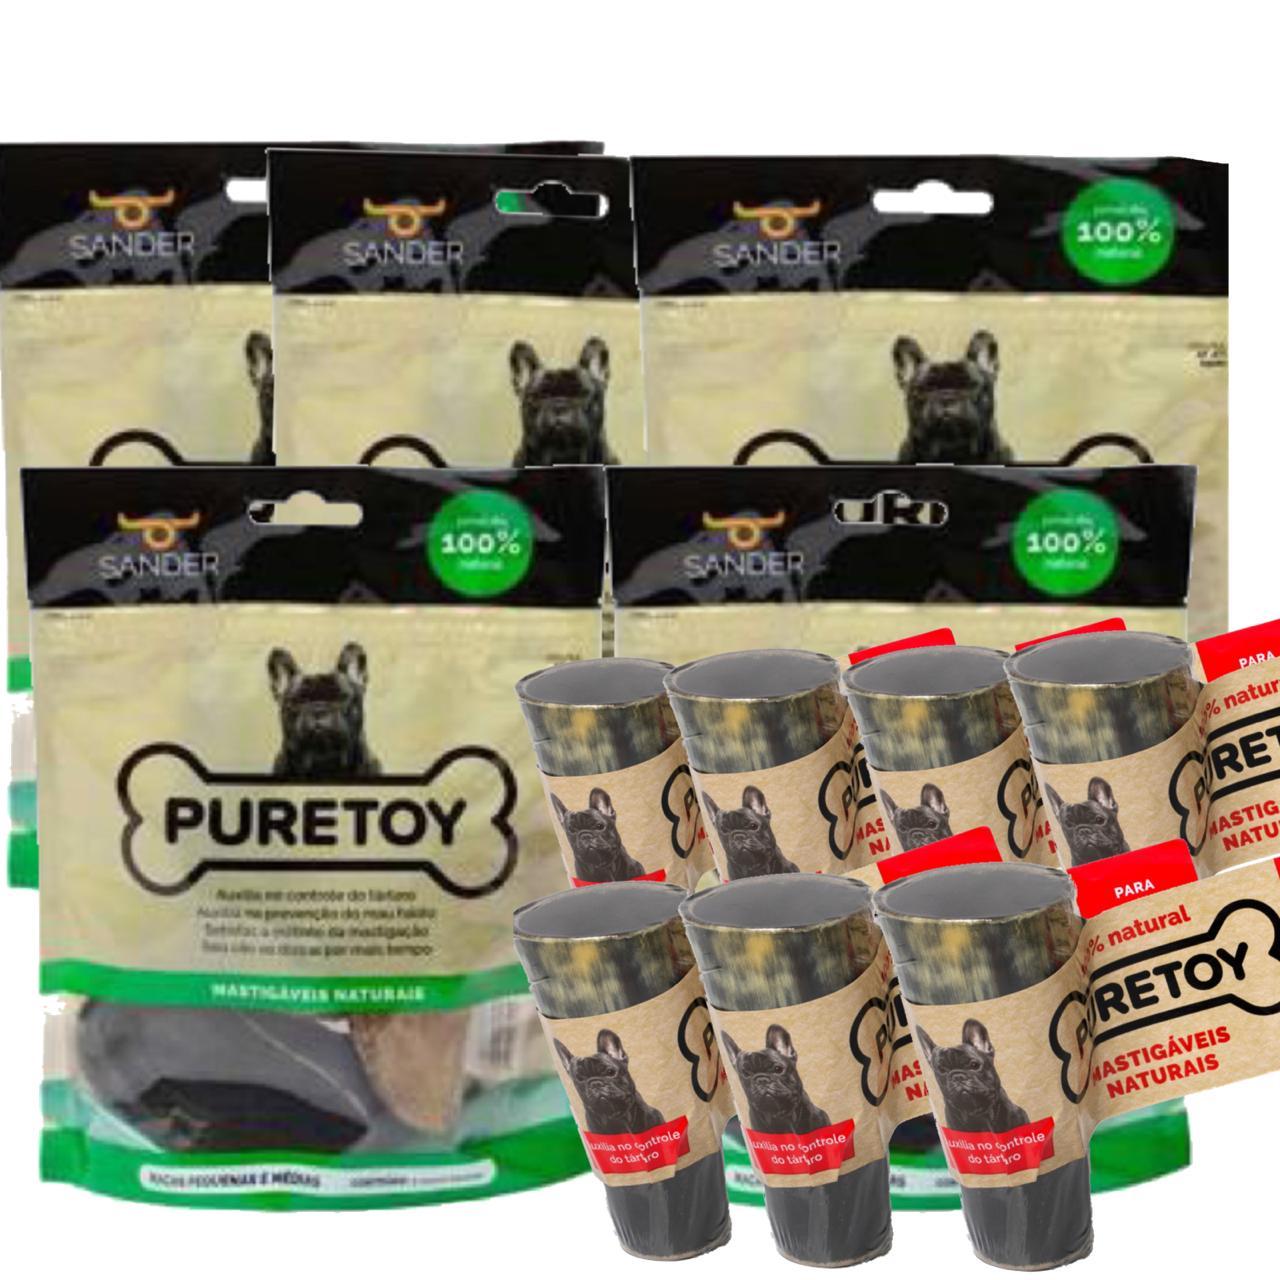 Kit Puretoy 15 cascos (5 pacotes) bovino + 7 chifres bovino